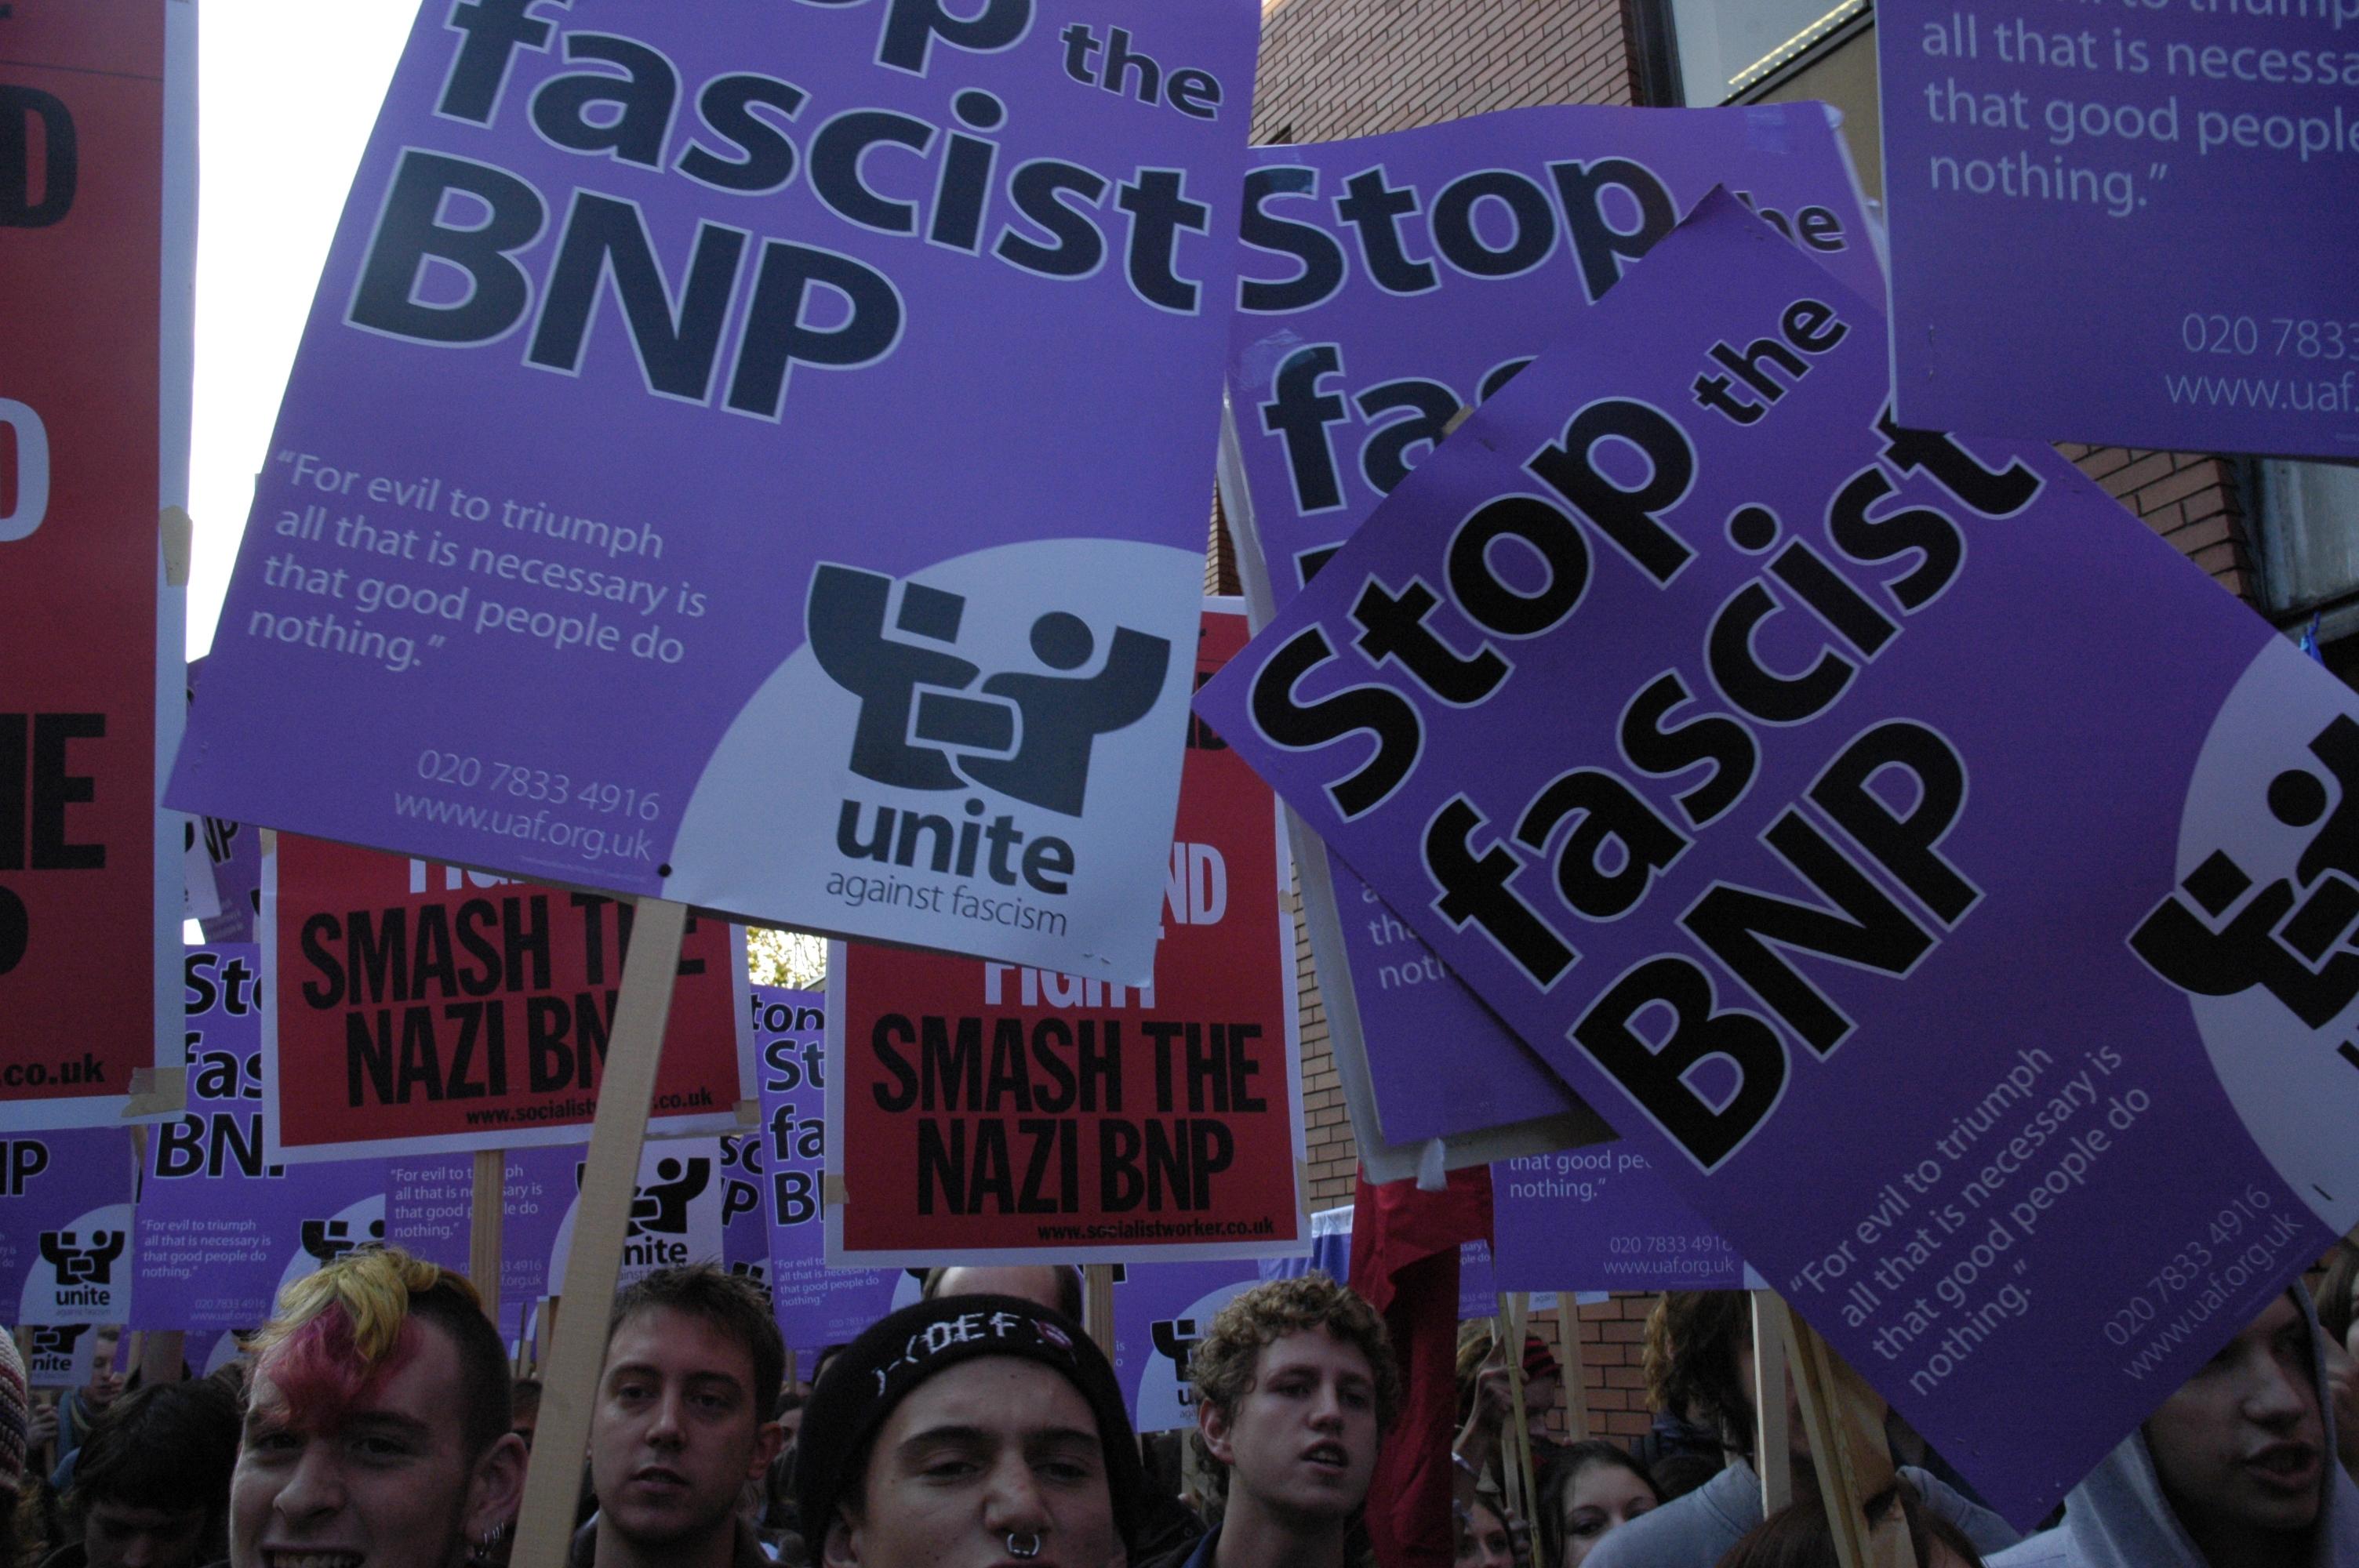 protestors at the unite against fascism march in Leeds